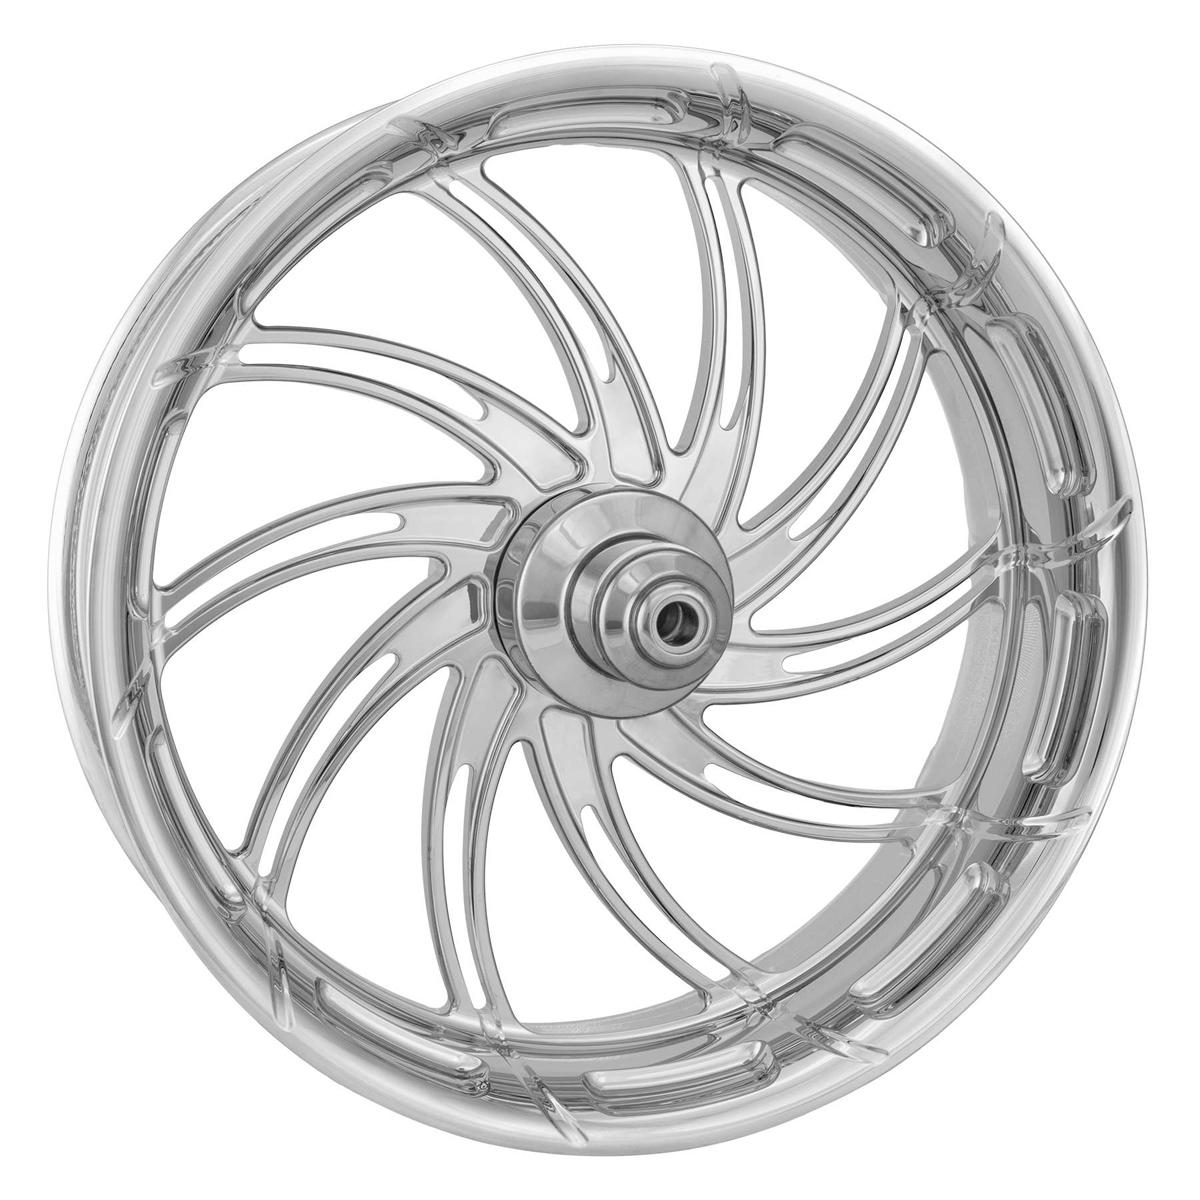 Performance Machine Supra Chrome Front Wheel 23x3.5 Non-ABS